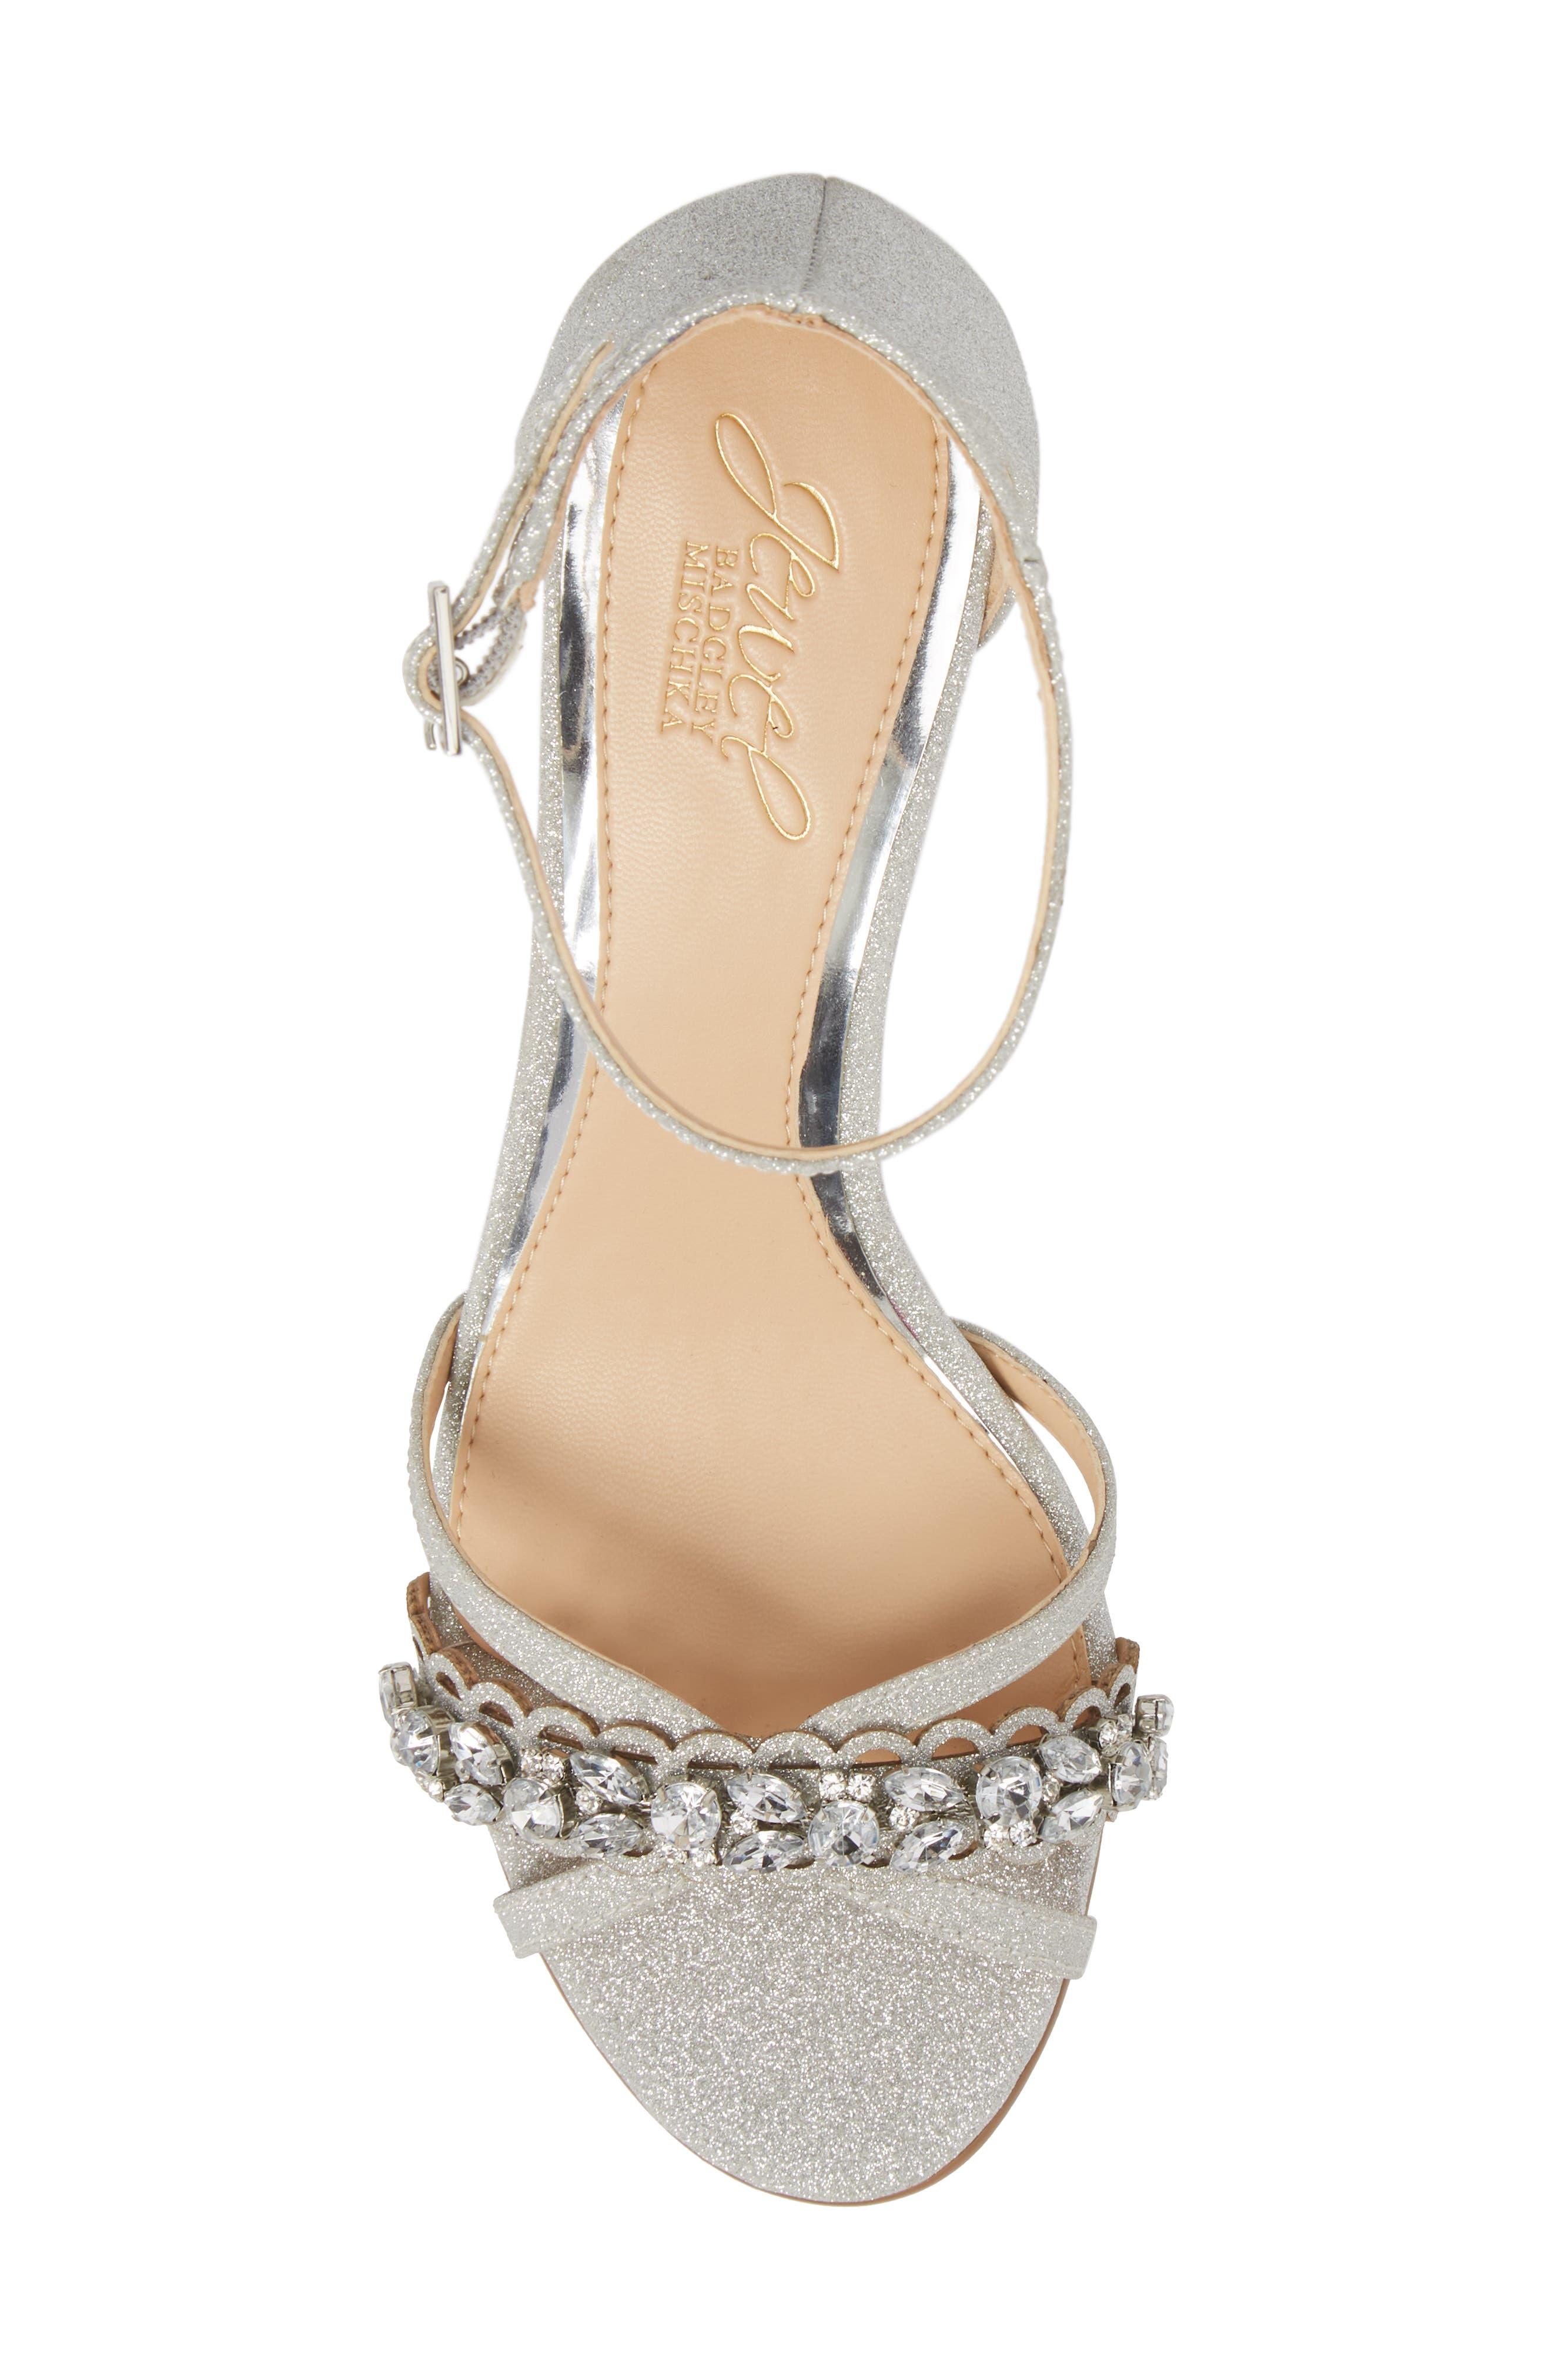 Giona Sandal,                             Alternate thumbnail 5, color,                             Silver Glitter Fabric